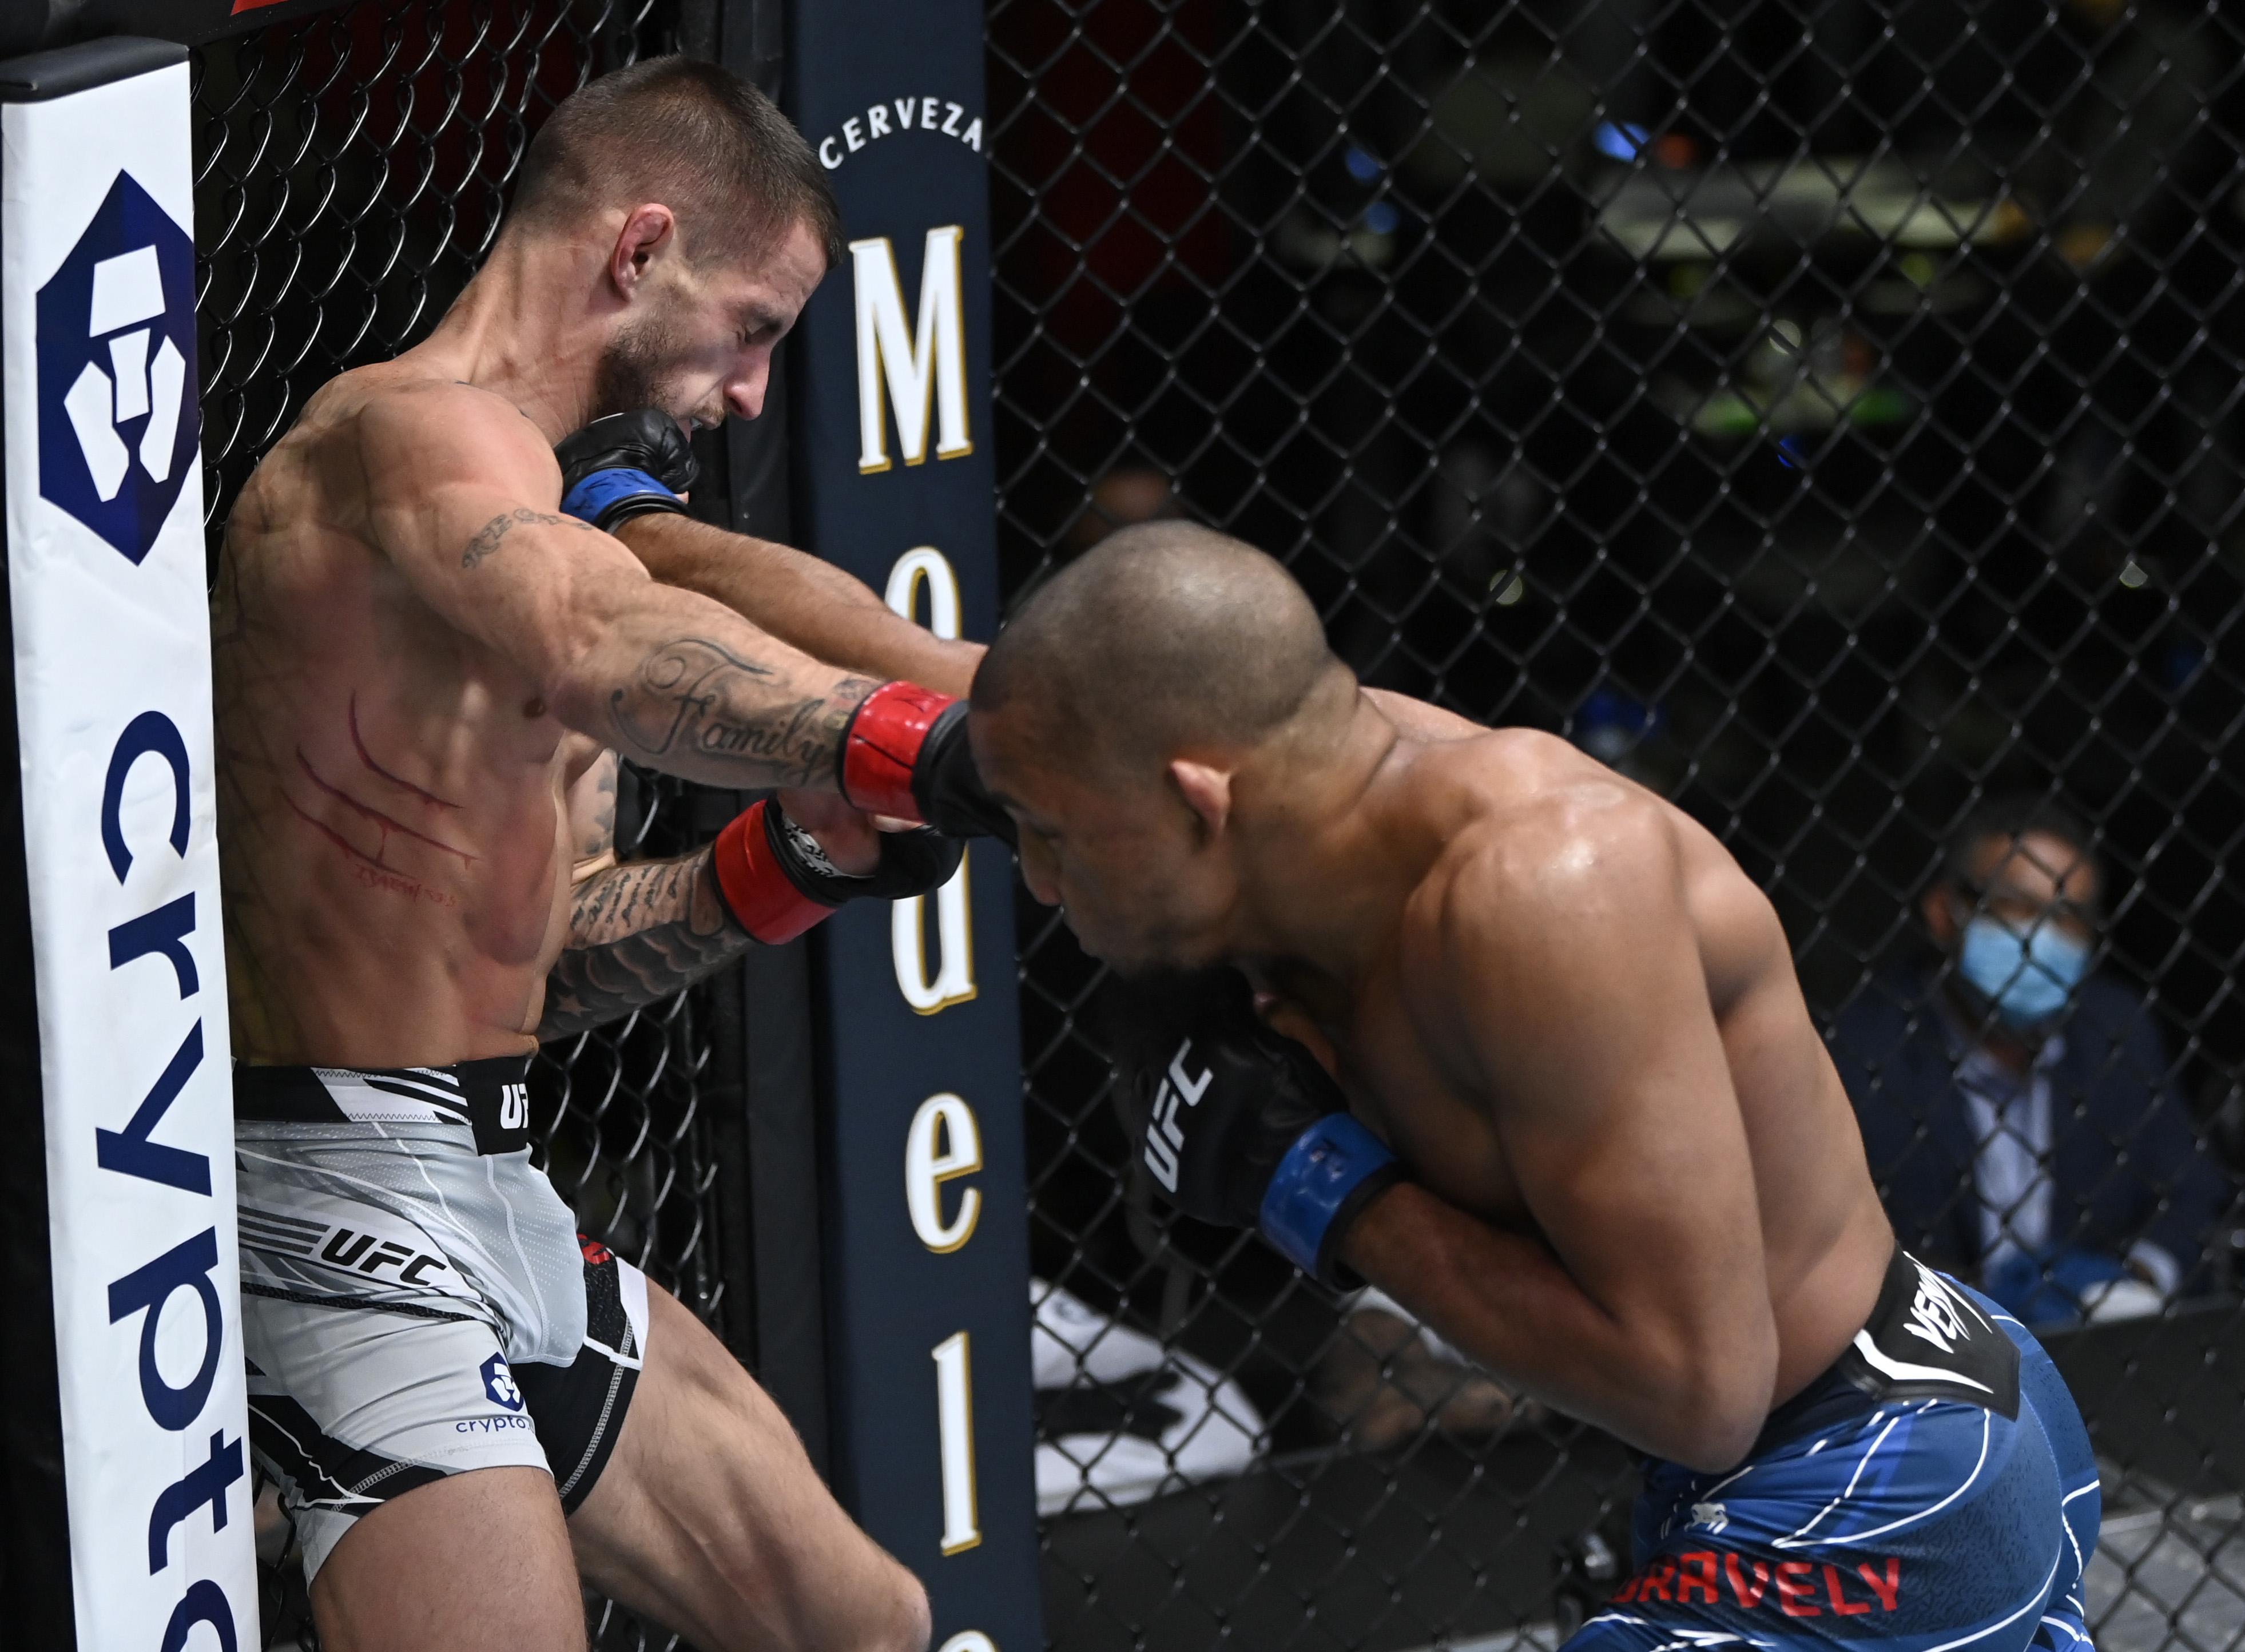 UFC Fight Night: Gravely v Maness